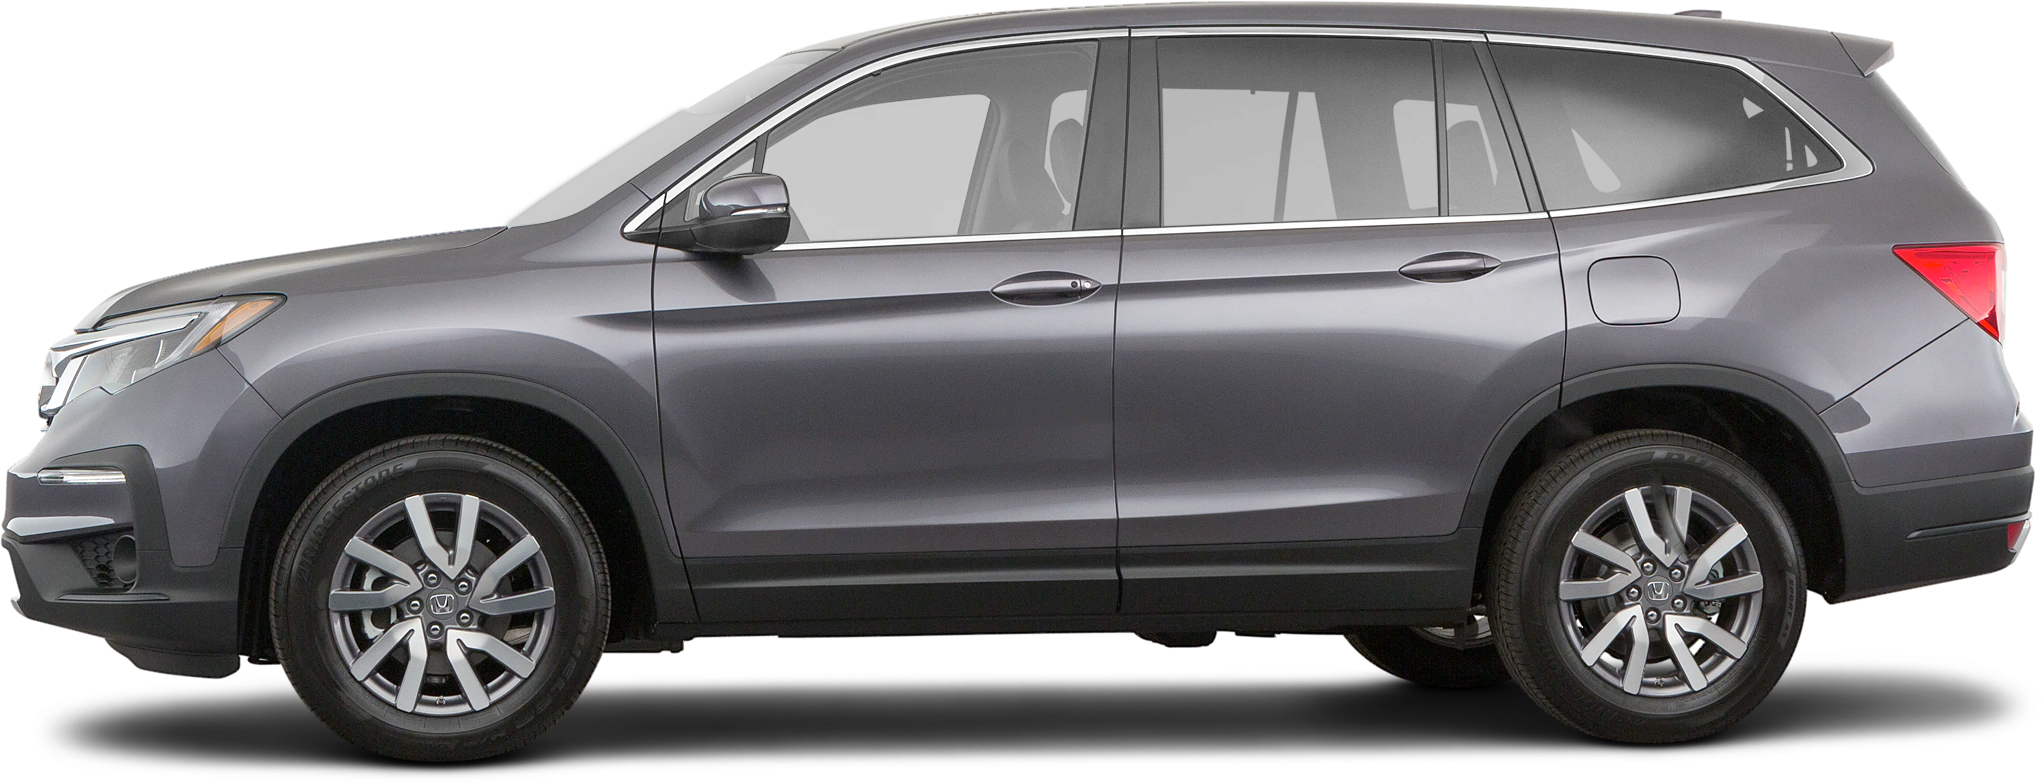 2020 Honda Pilot SUV EX-L AWD